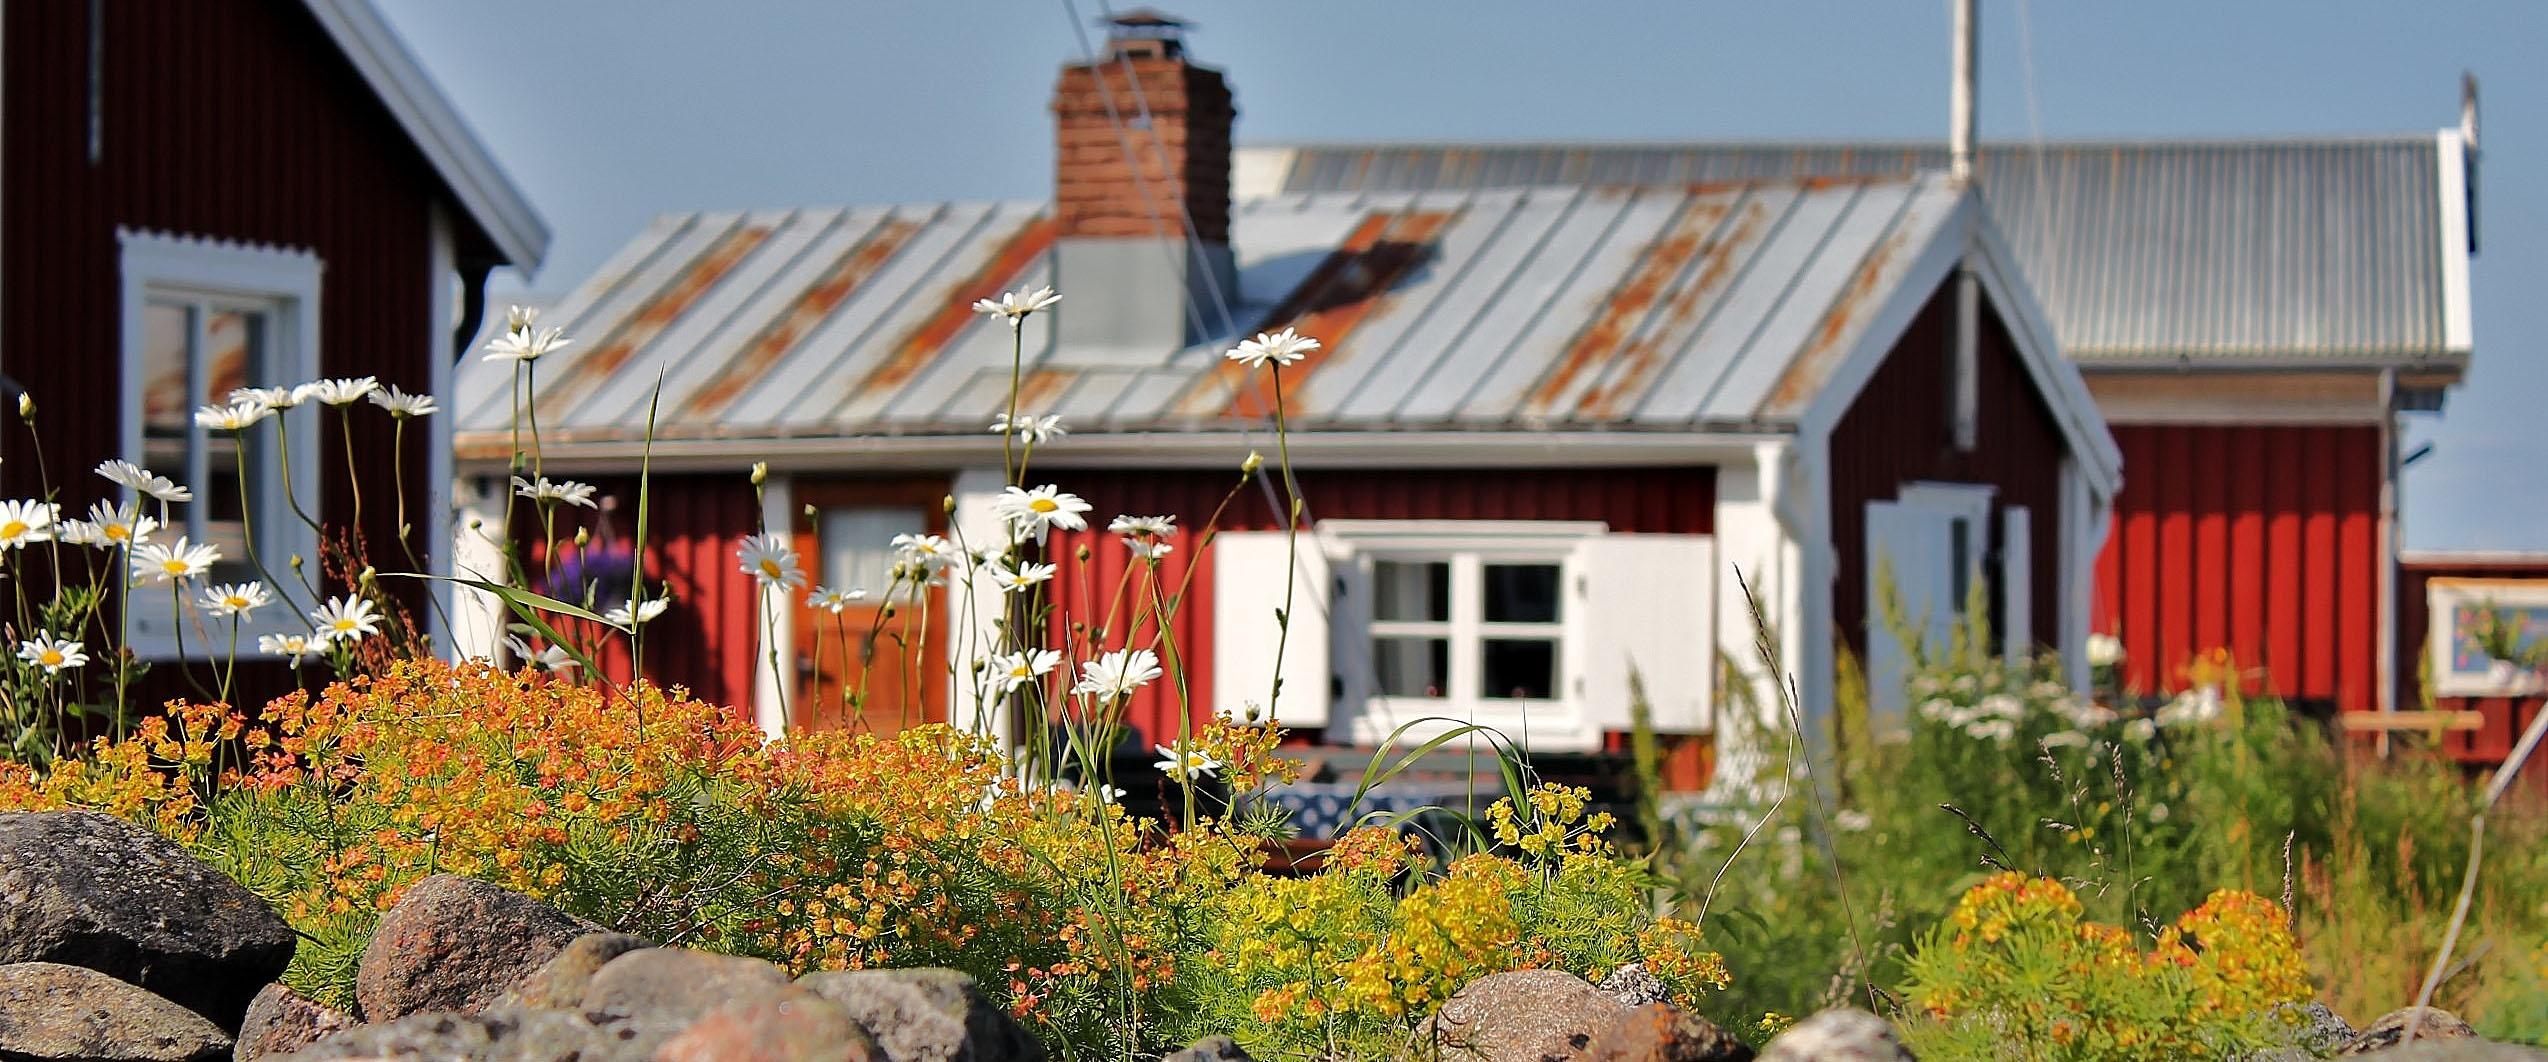 Miljöbild exteriört Pite Rönnskär